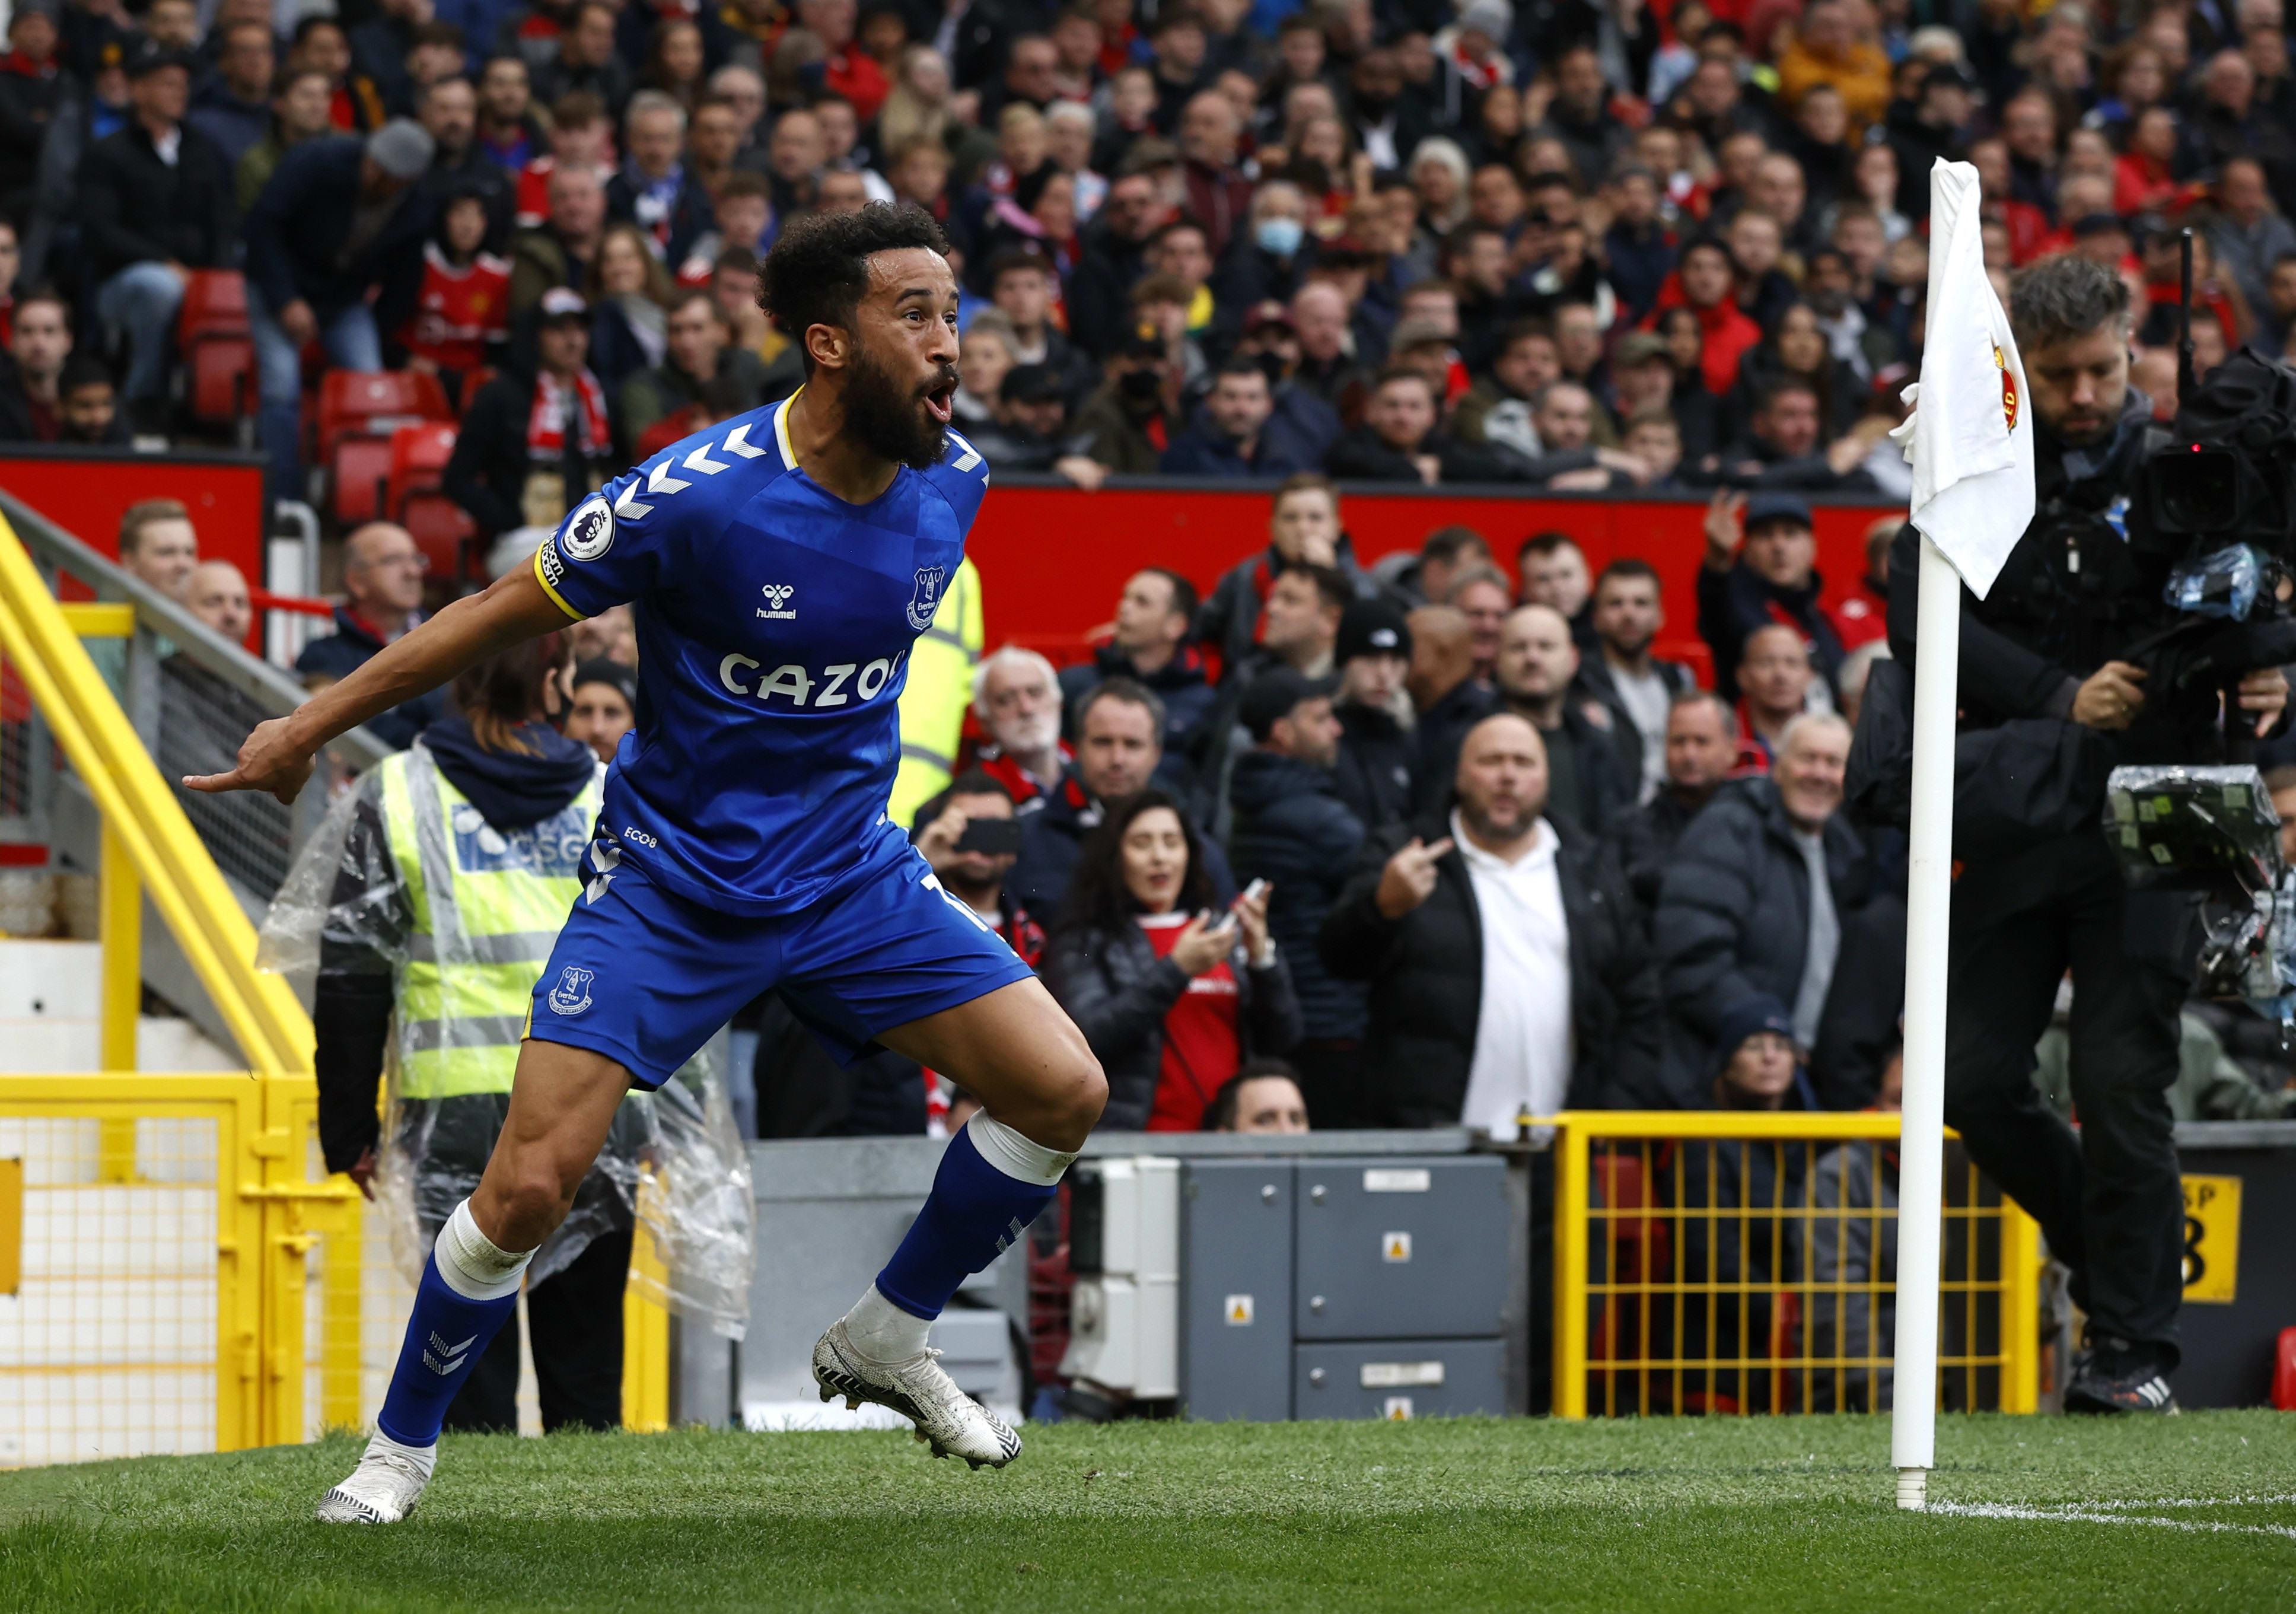 Everton striker Andrews Townsend celebrates against United